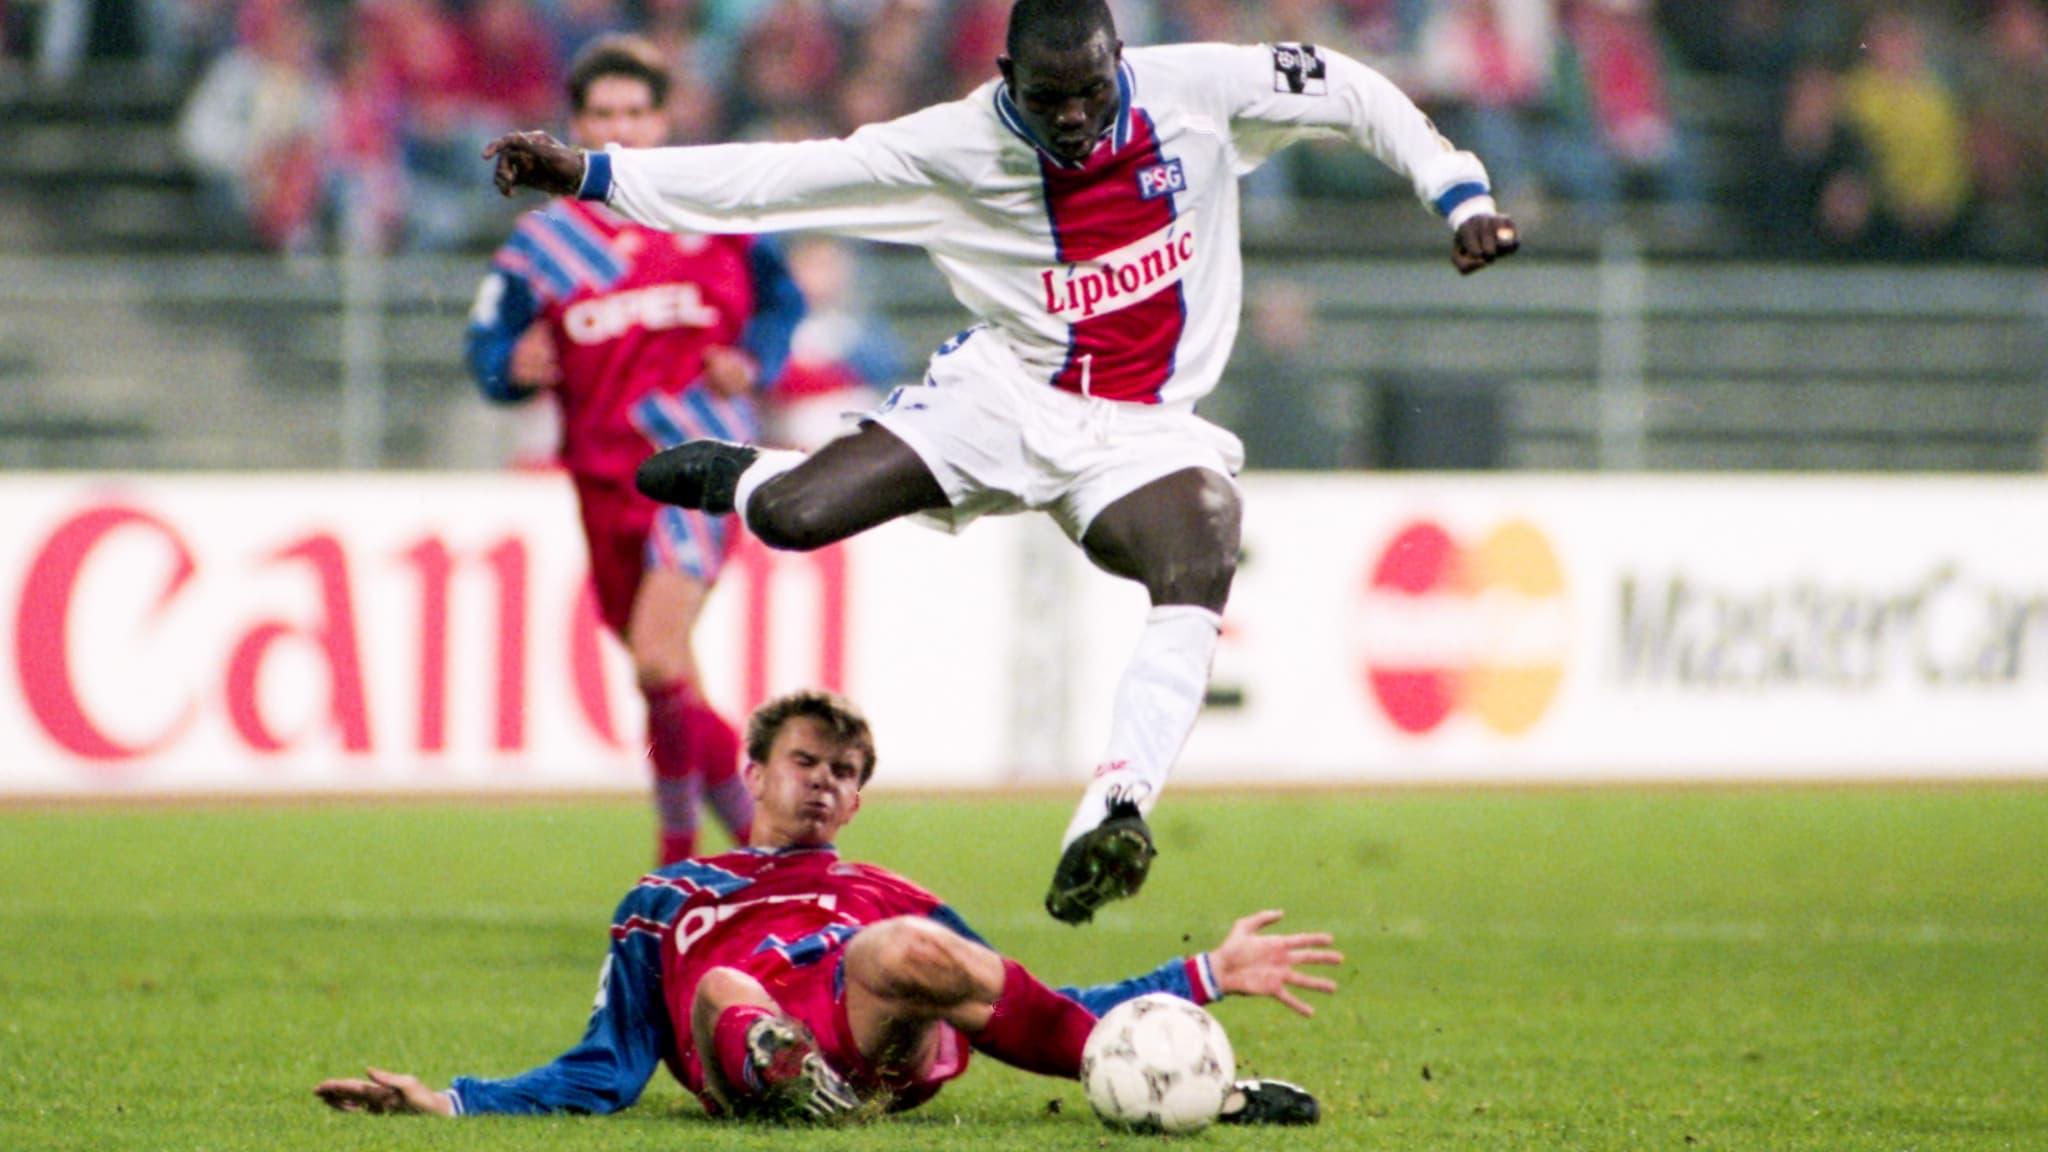 https://images.bfmtv.com/zn2iinTwFwBddcKrrl5FgqVsJyA=/0x85:2048x1237/images/George-Weah-face-au-Bayern-Munich-en-1994-1001014.jpg